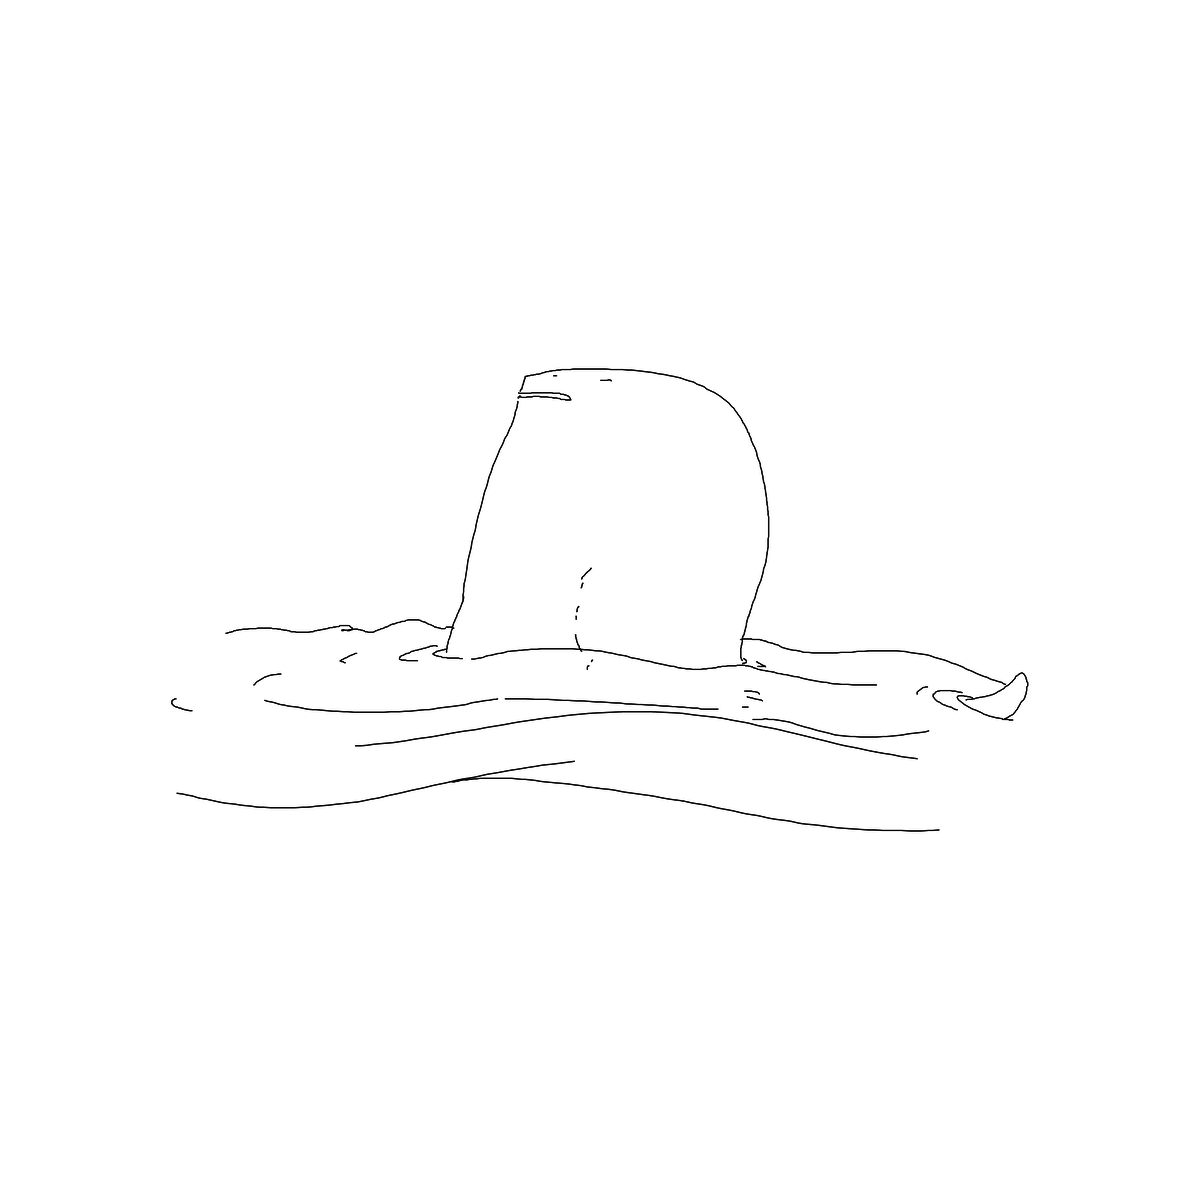 BAAAM drawing#16869 lat:78.4201965332031200lng: -4.4828481674194340